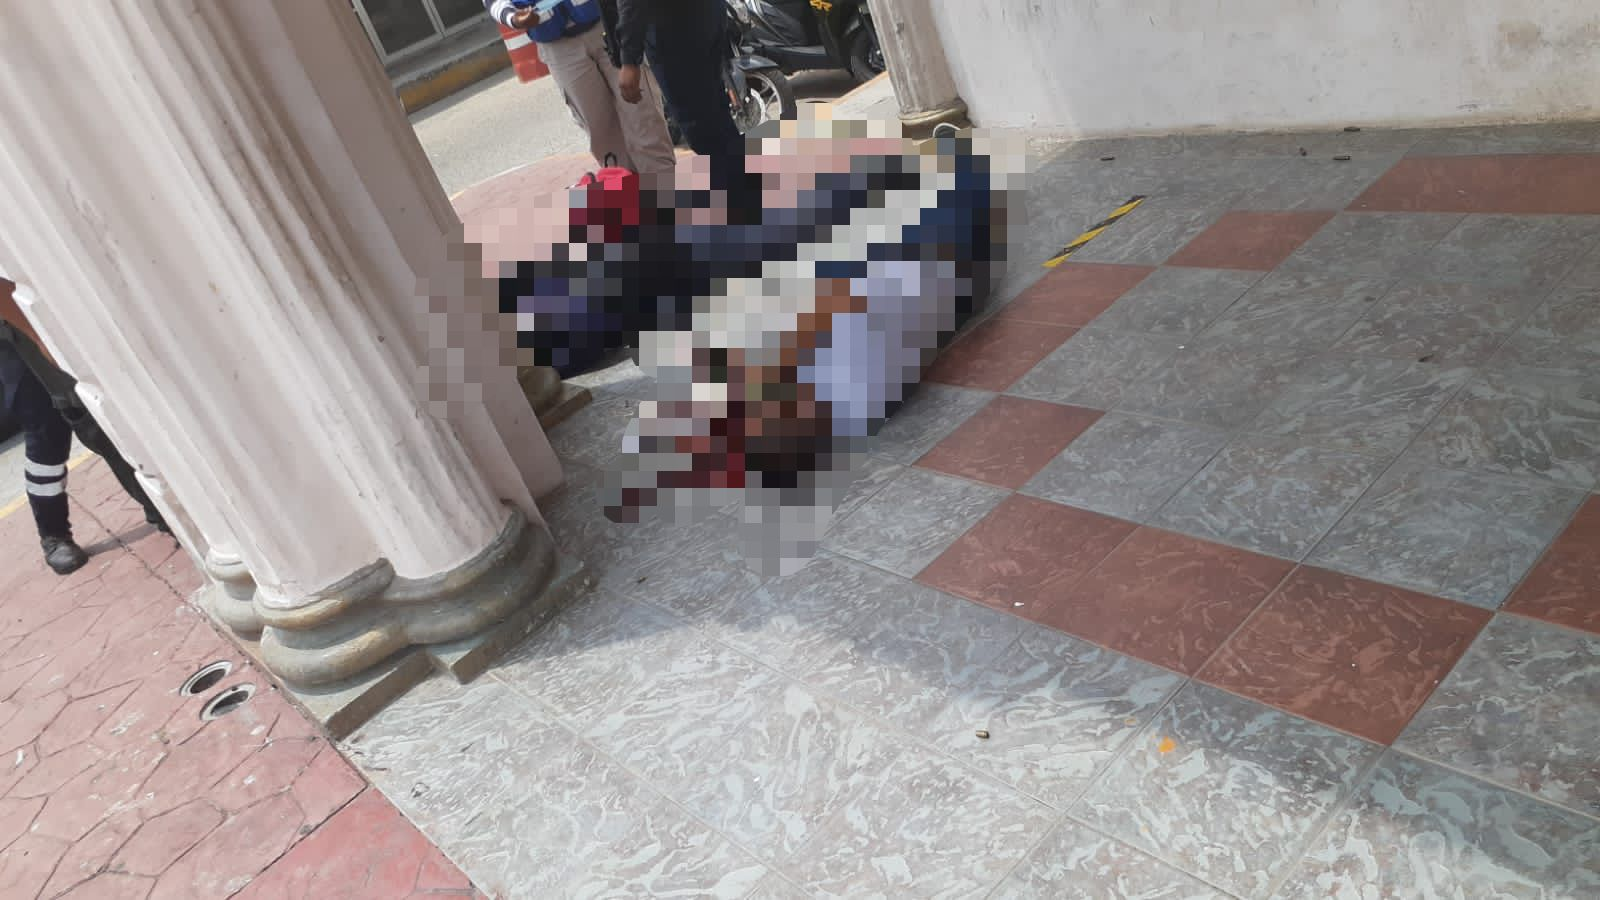 Acribillan a civil y hieren a Policia en Cosamaloapan, Veracruz